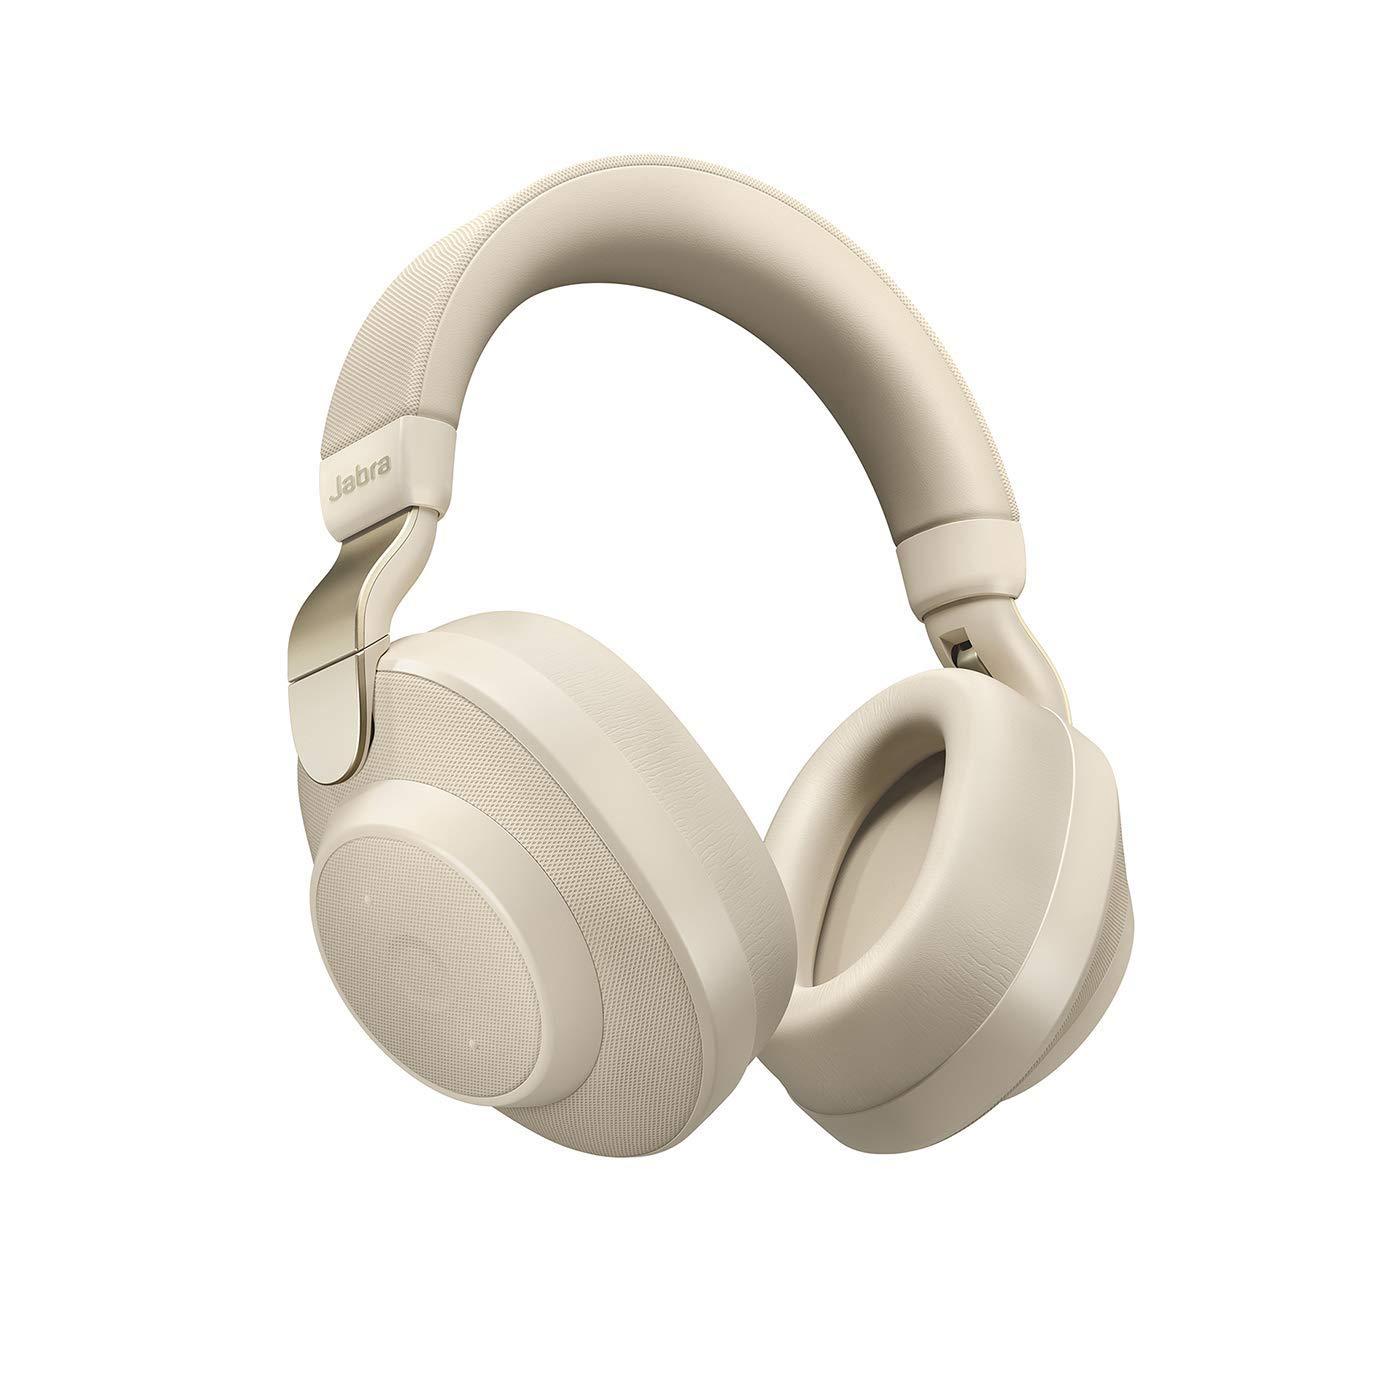 Jabra Elite 85h - Gold Beige Over Ear Headphones with ANC